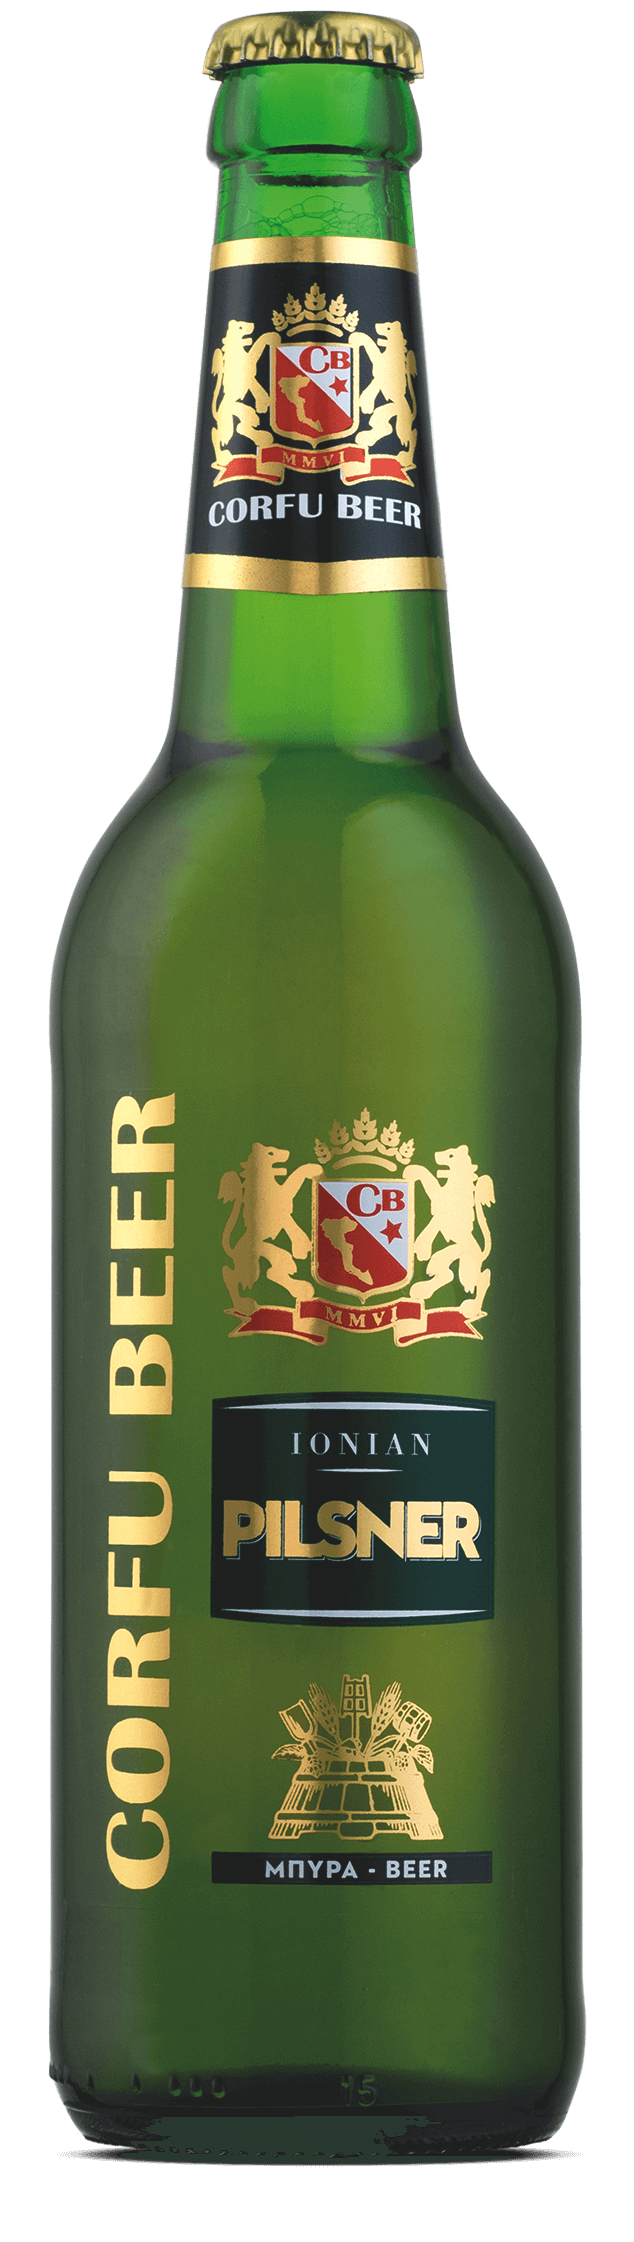 Corfu beer Κερκυραίική Ζυθοποιία mykerkyra.com